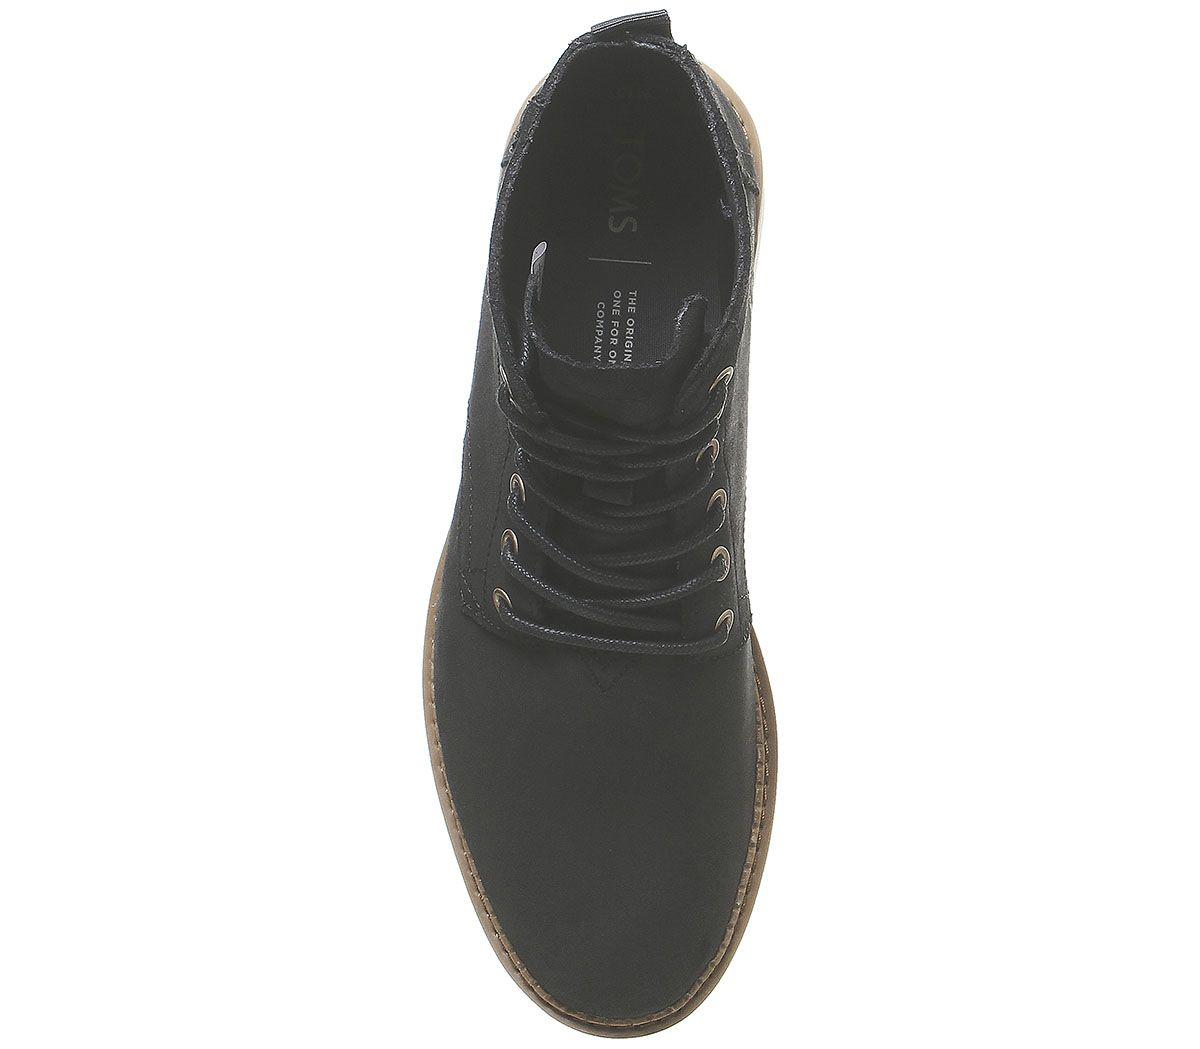 3912299e24b Toms Porter Boots Black - Boots